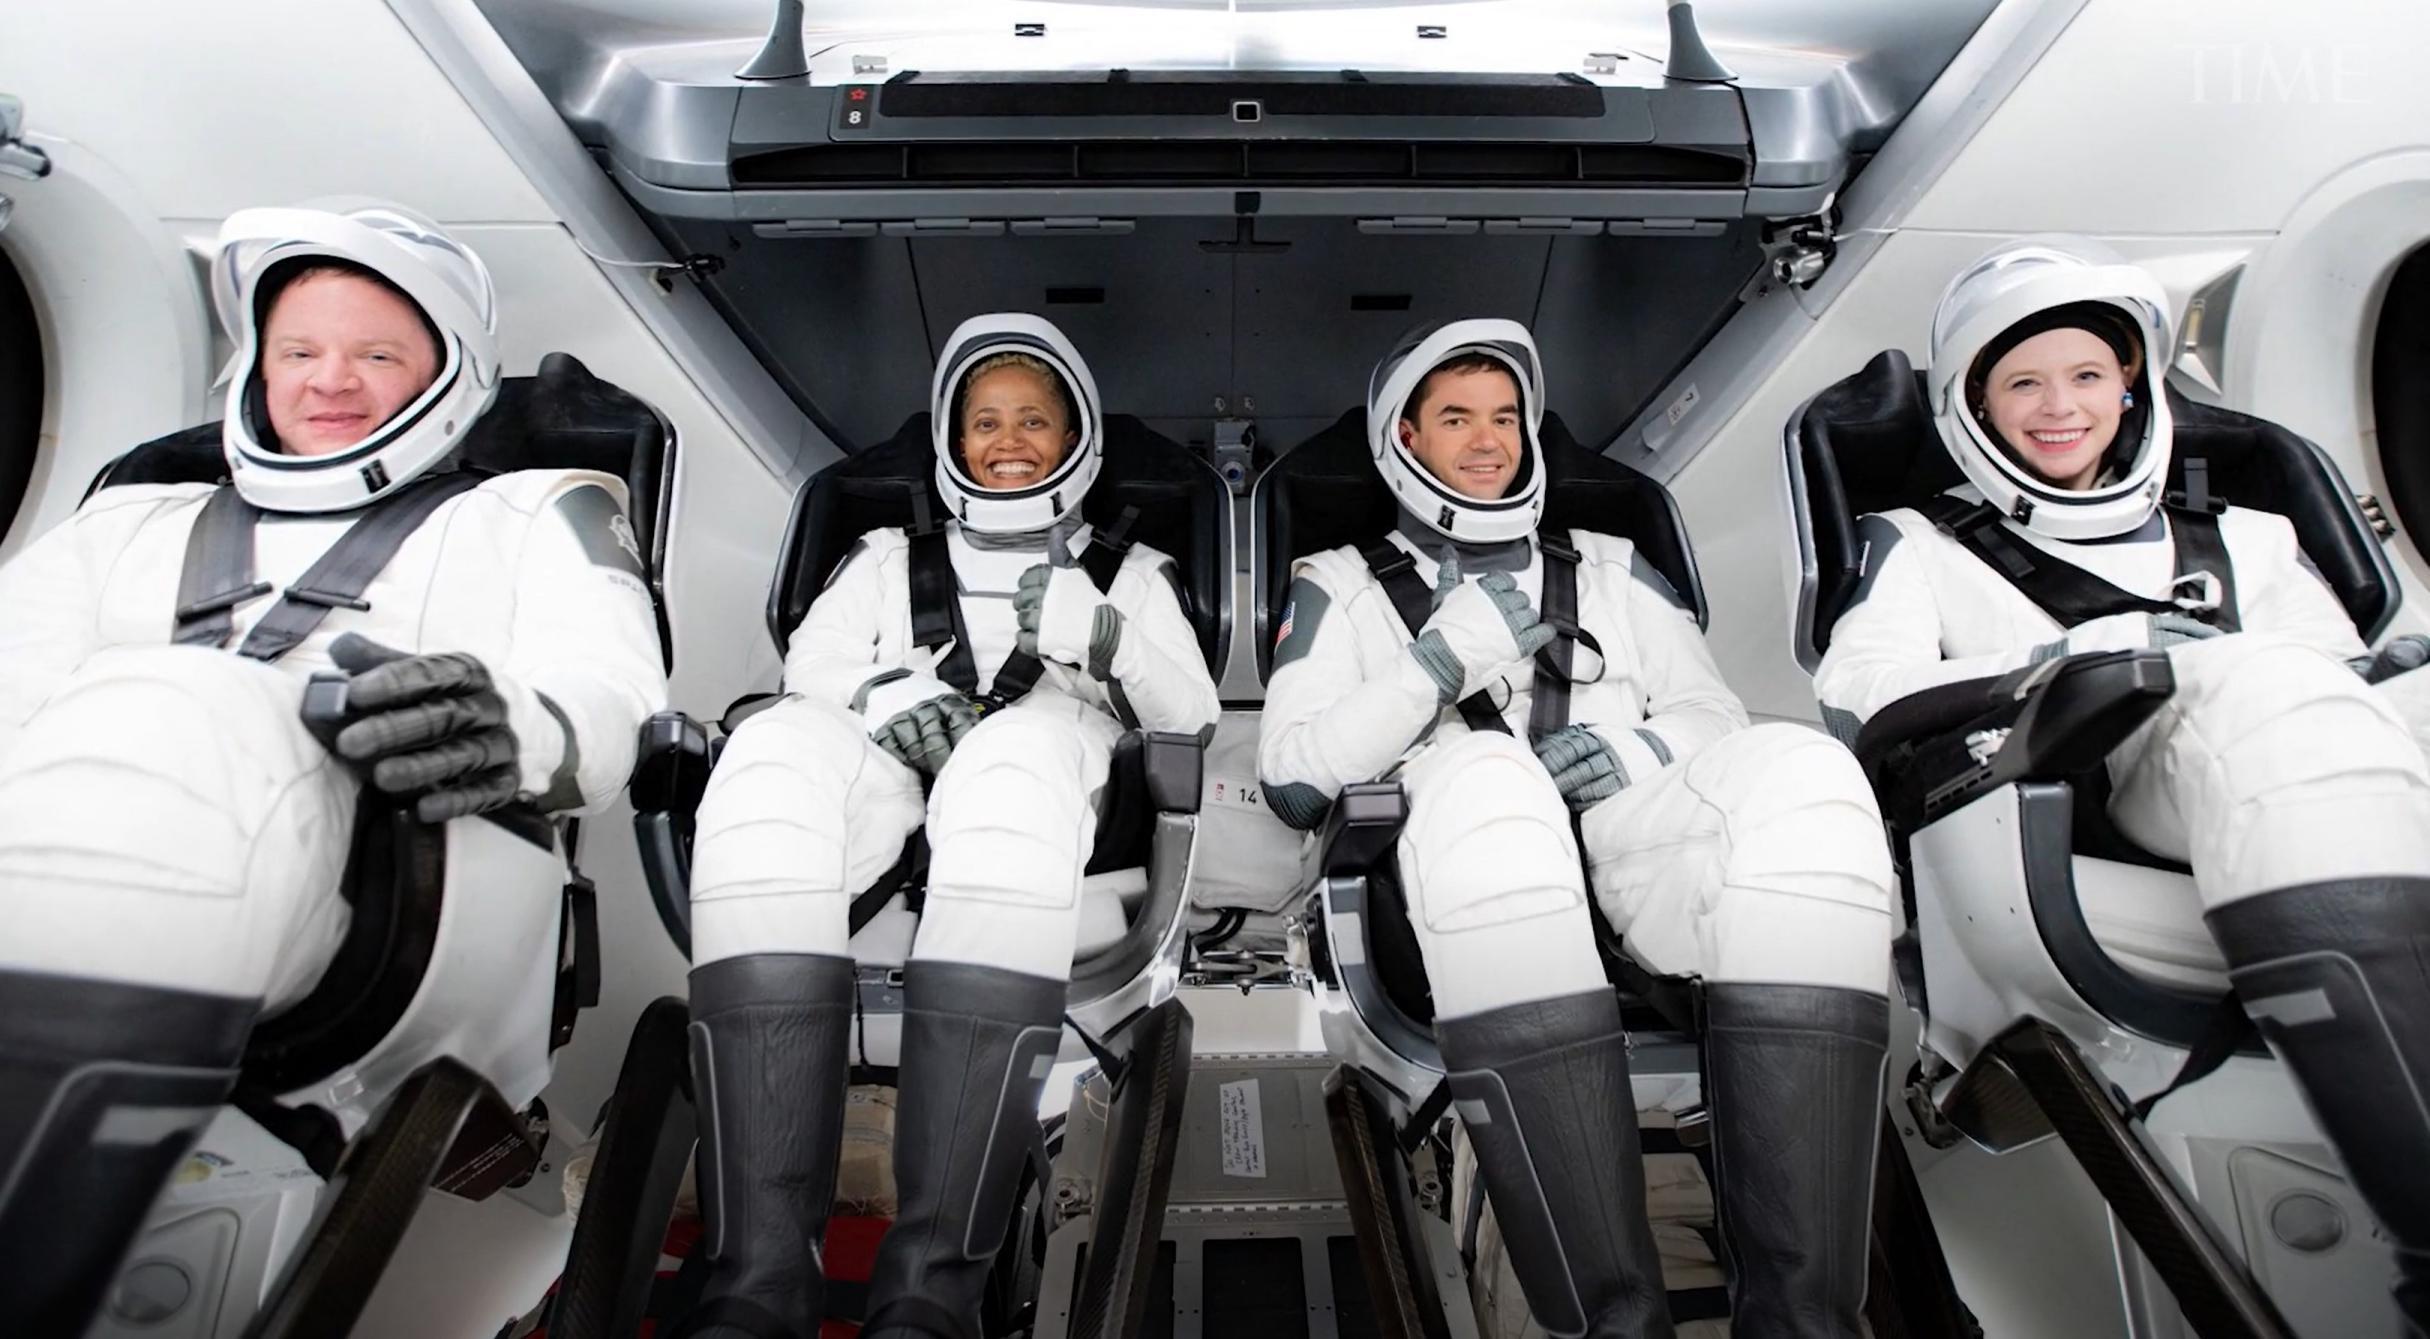 Inspiration4 crew (SpaceX) 1 (c)